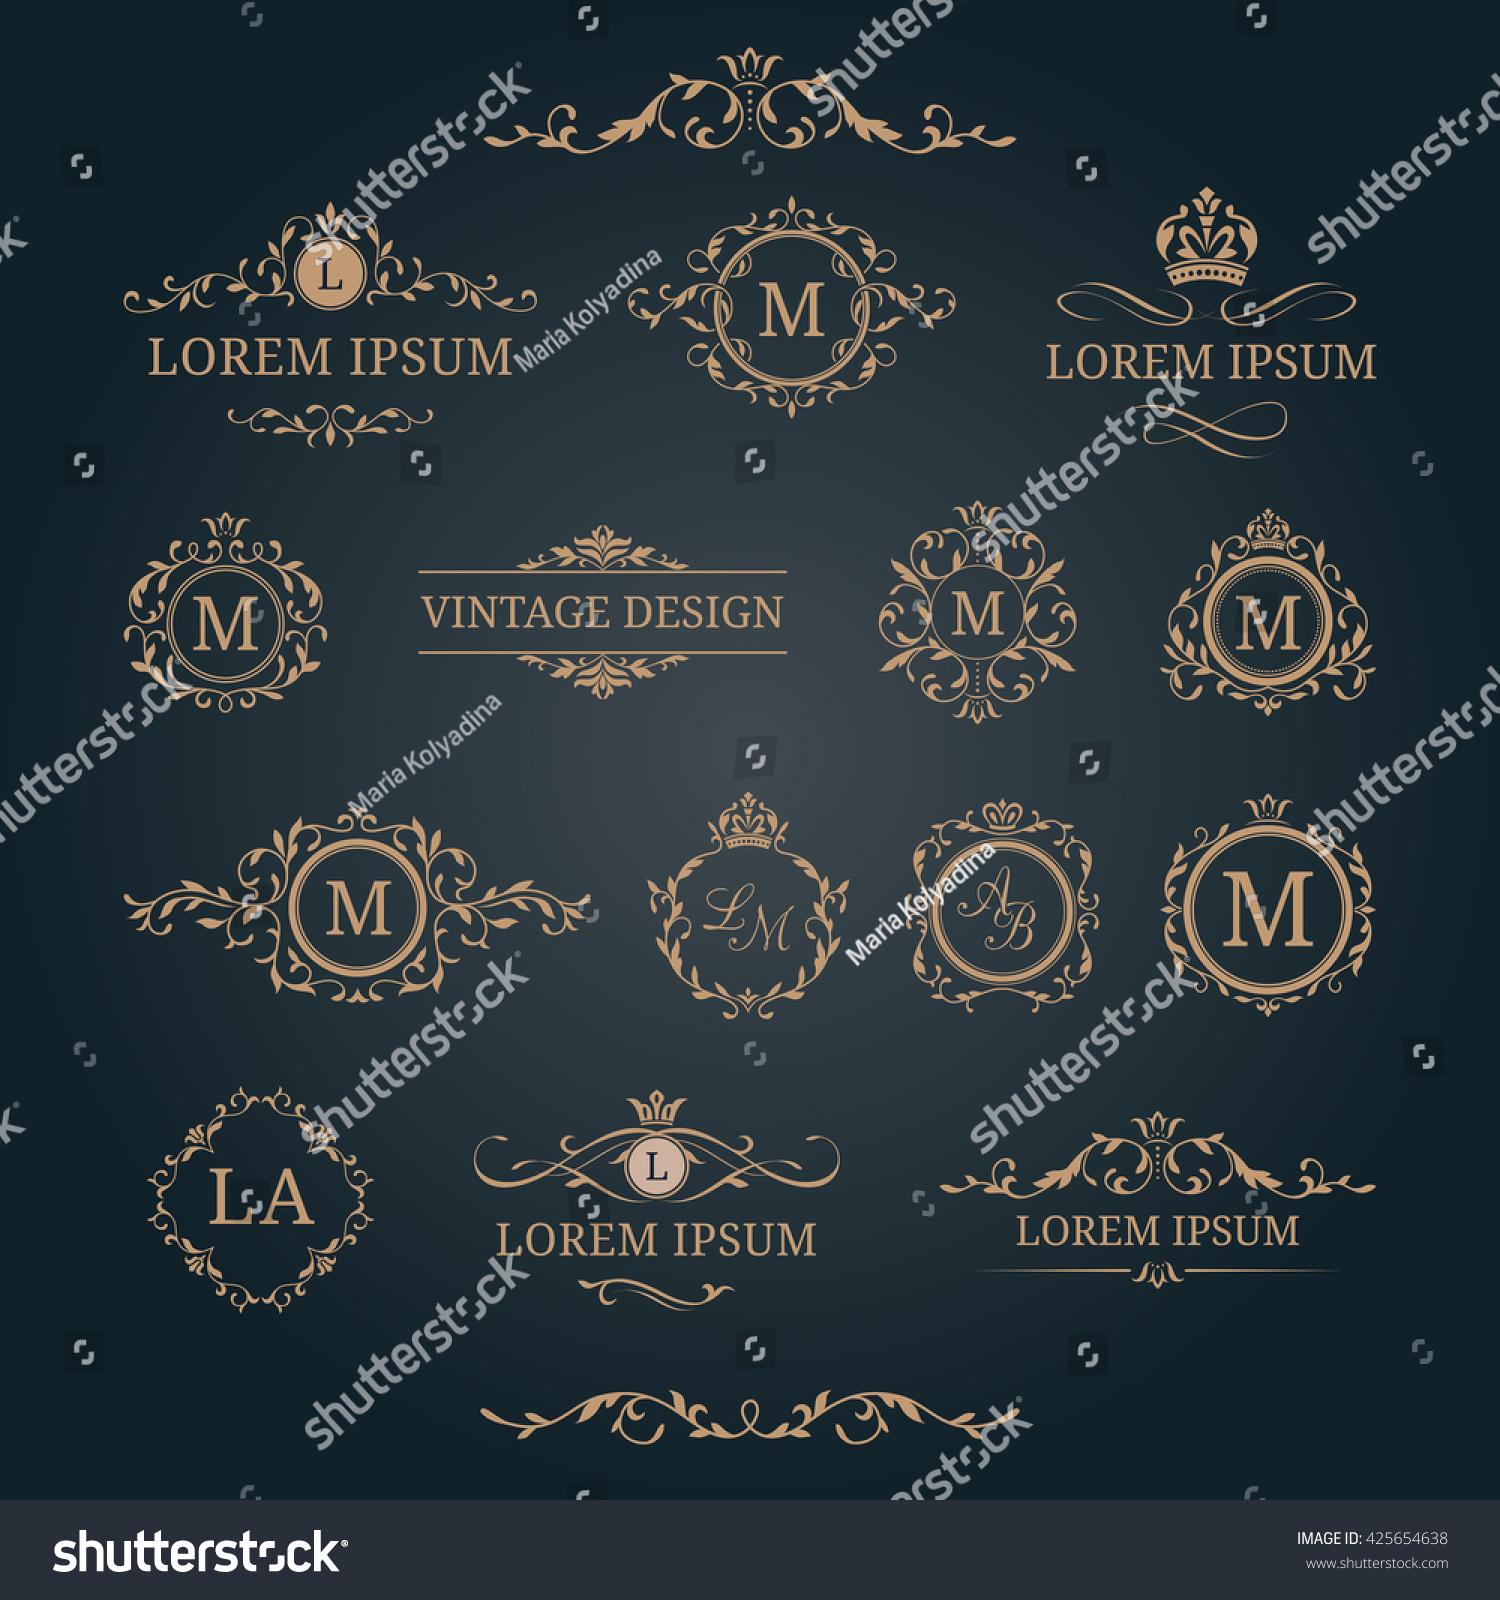 Elegant Floral Monograms Borders Design Templates Stock Vector ...